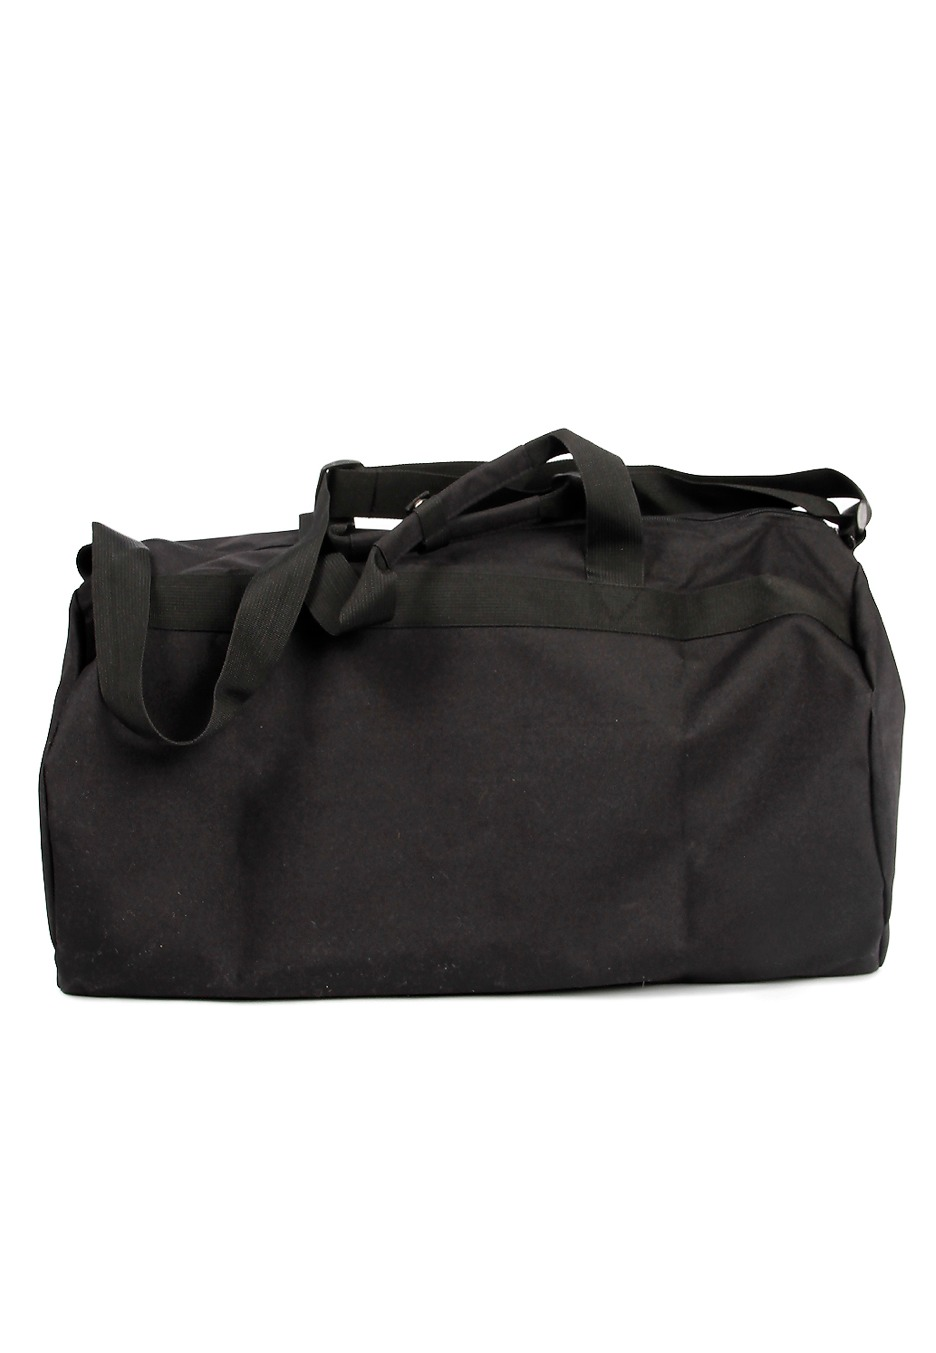 c2f744b4967d Carhartt WIP - Drifter - Bag - Streetwear Shop - Impericon.com UK